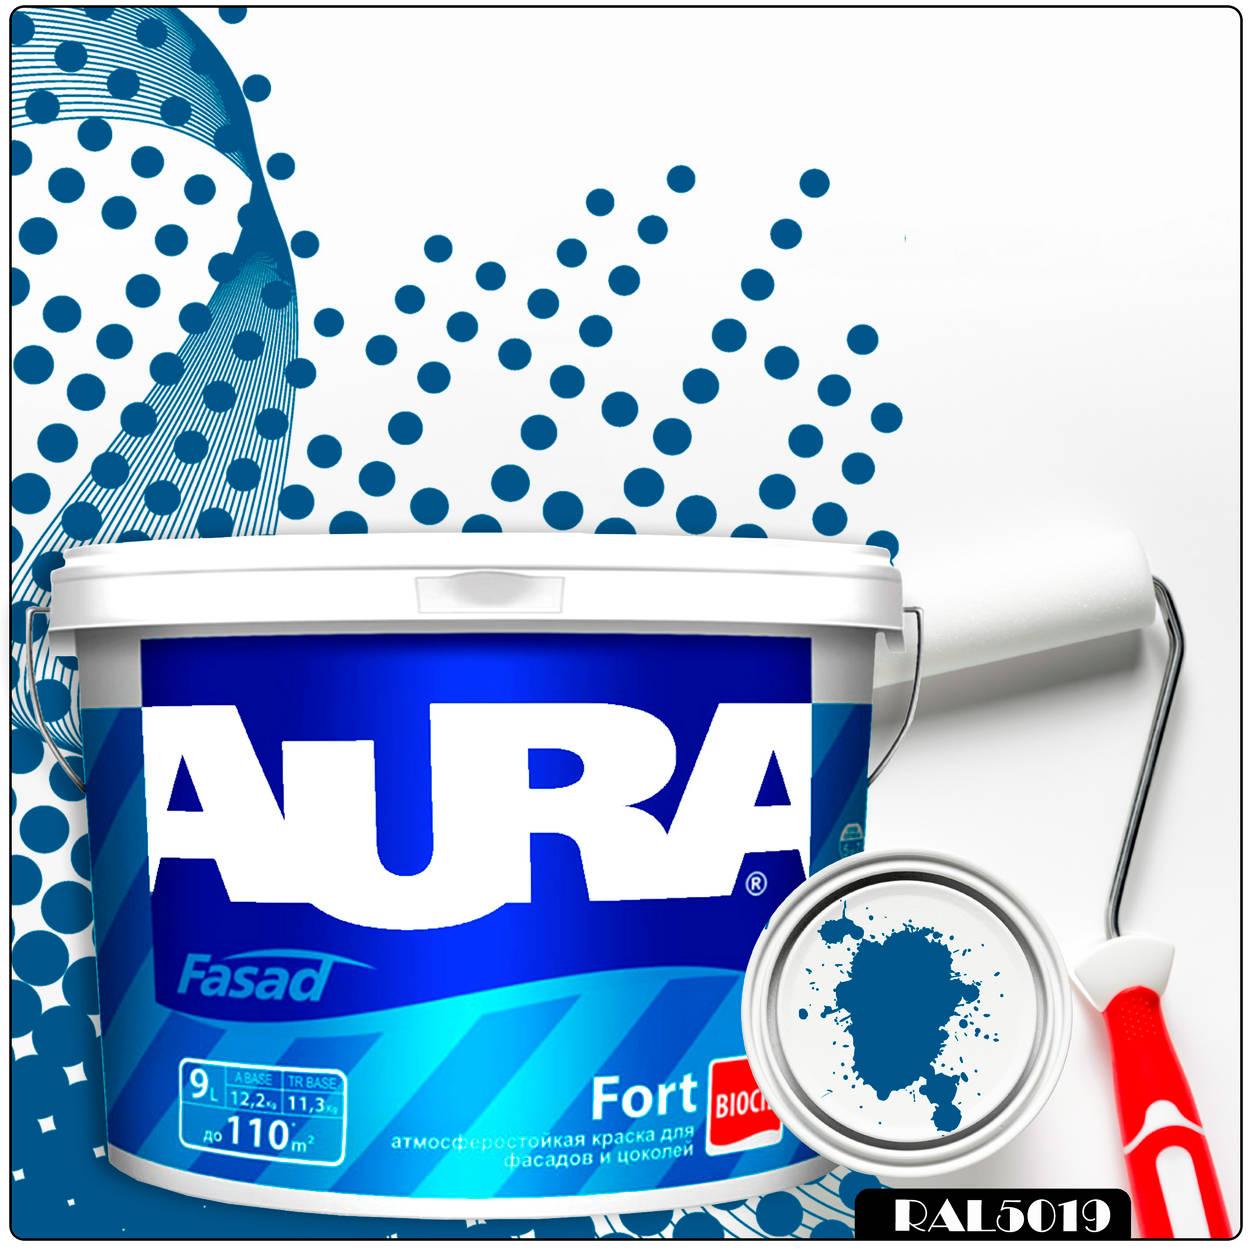 Фото 18 - Краска Aura Fasad Fort, RAL 5019 Синий, латексная, матовая, для фасада и цоколей, 9л, Аура.